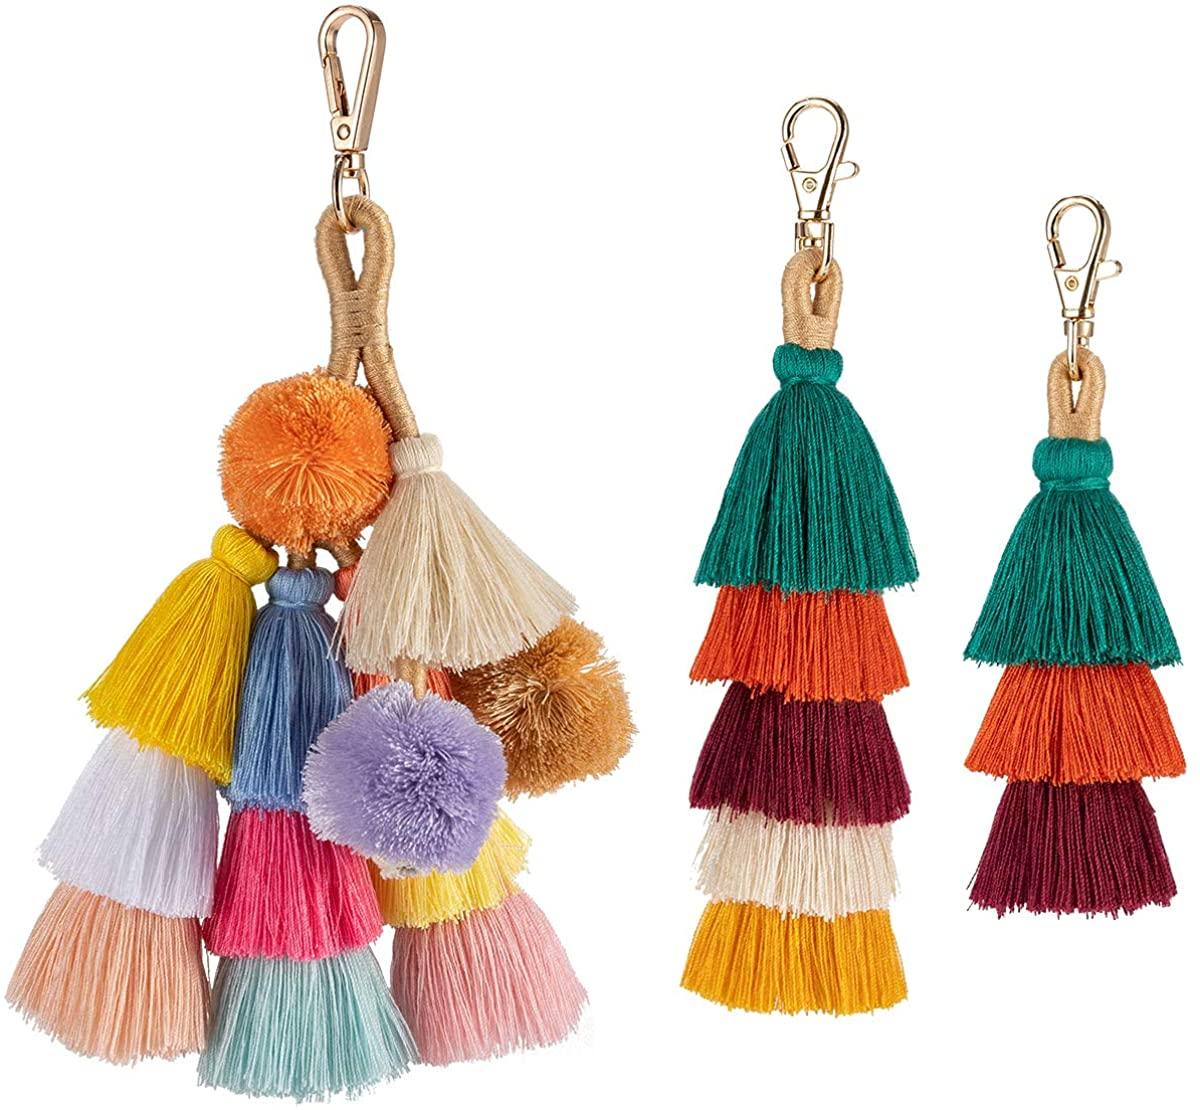 Cosweet 3 Pcs Handmade Cotton Bohemian Tassels Charm Keychain Car Keyring Handbag Bag Purse Wallet Pendant